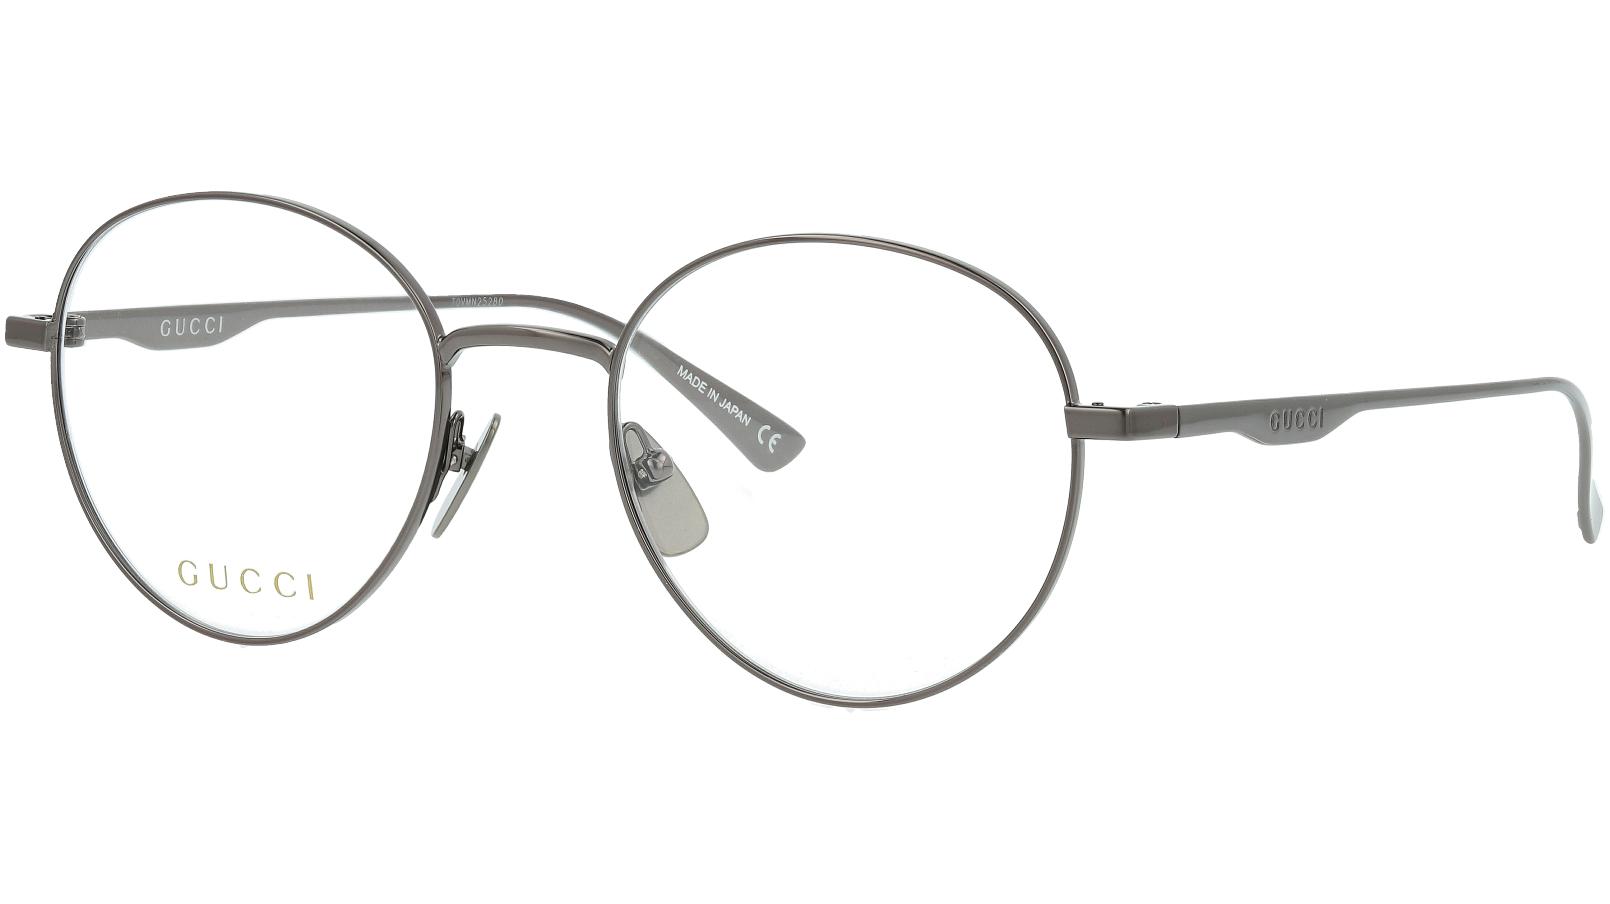 GUCCI GG0337O 007 51 RUTHENIUM Glasses